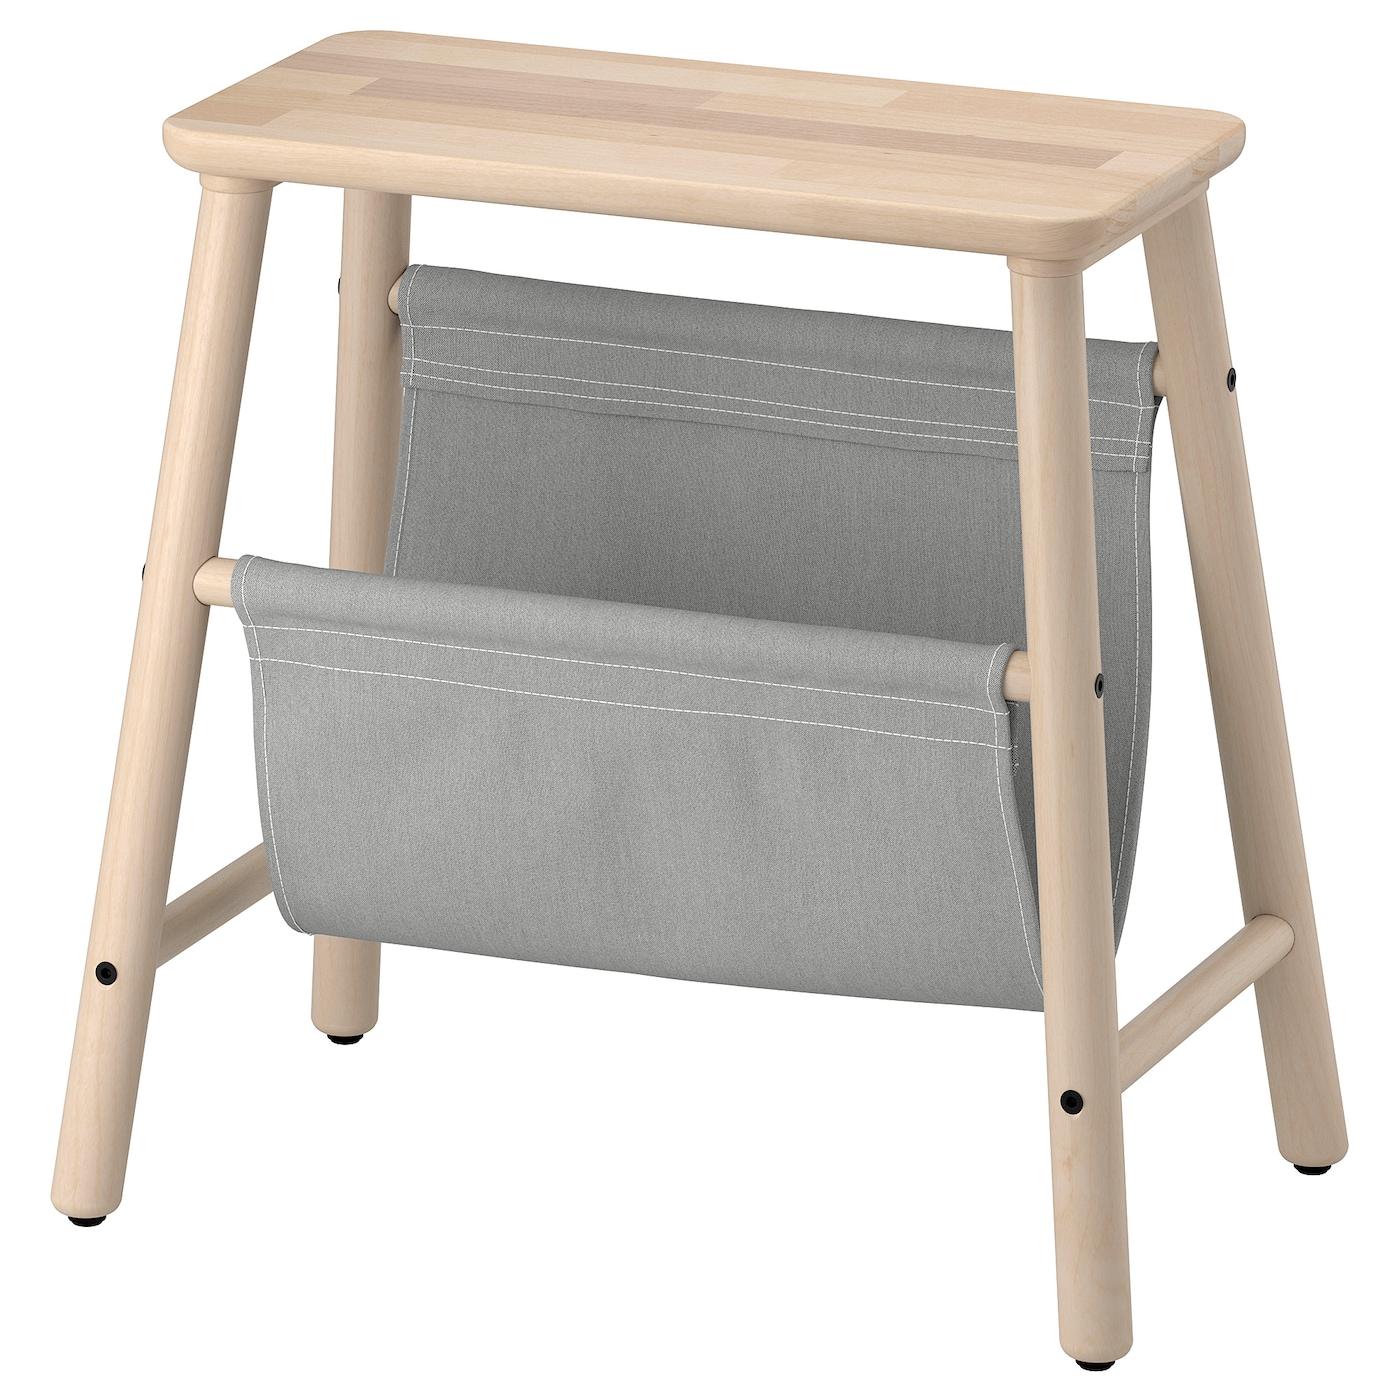 Sgabello Bambini Bagno Ikea vilto sgabello con contenitore - betulla 45 cm